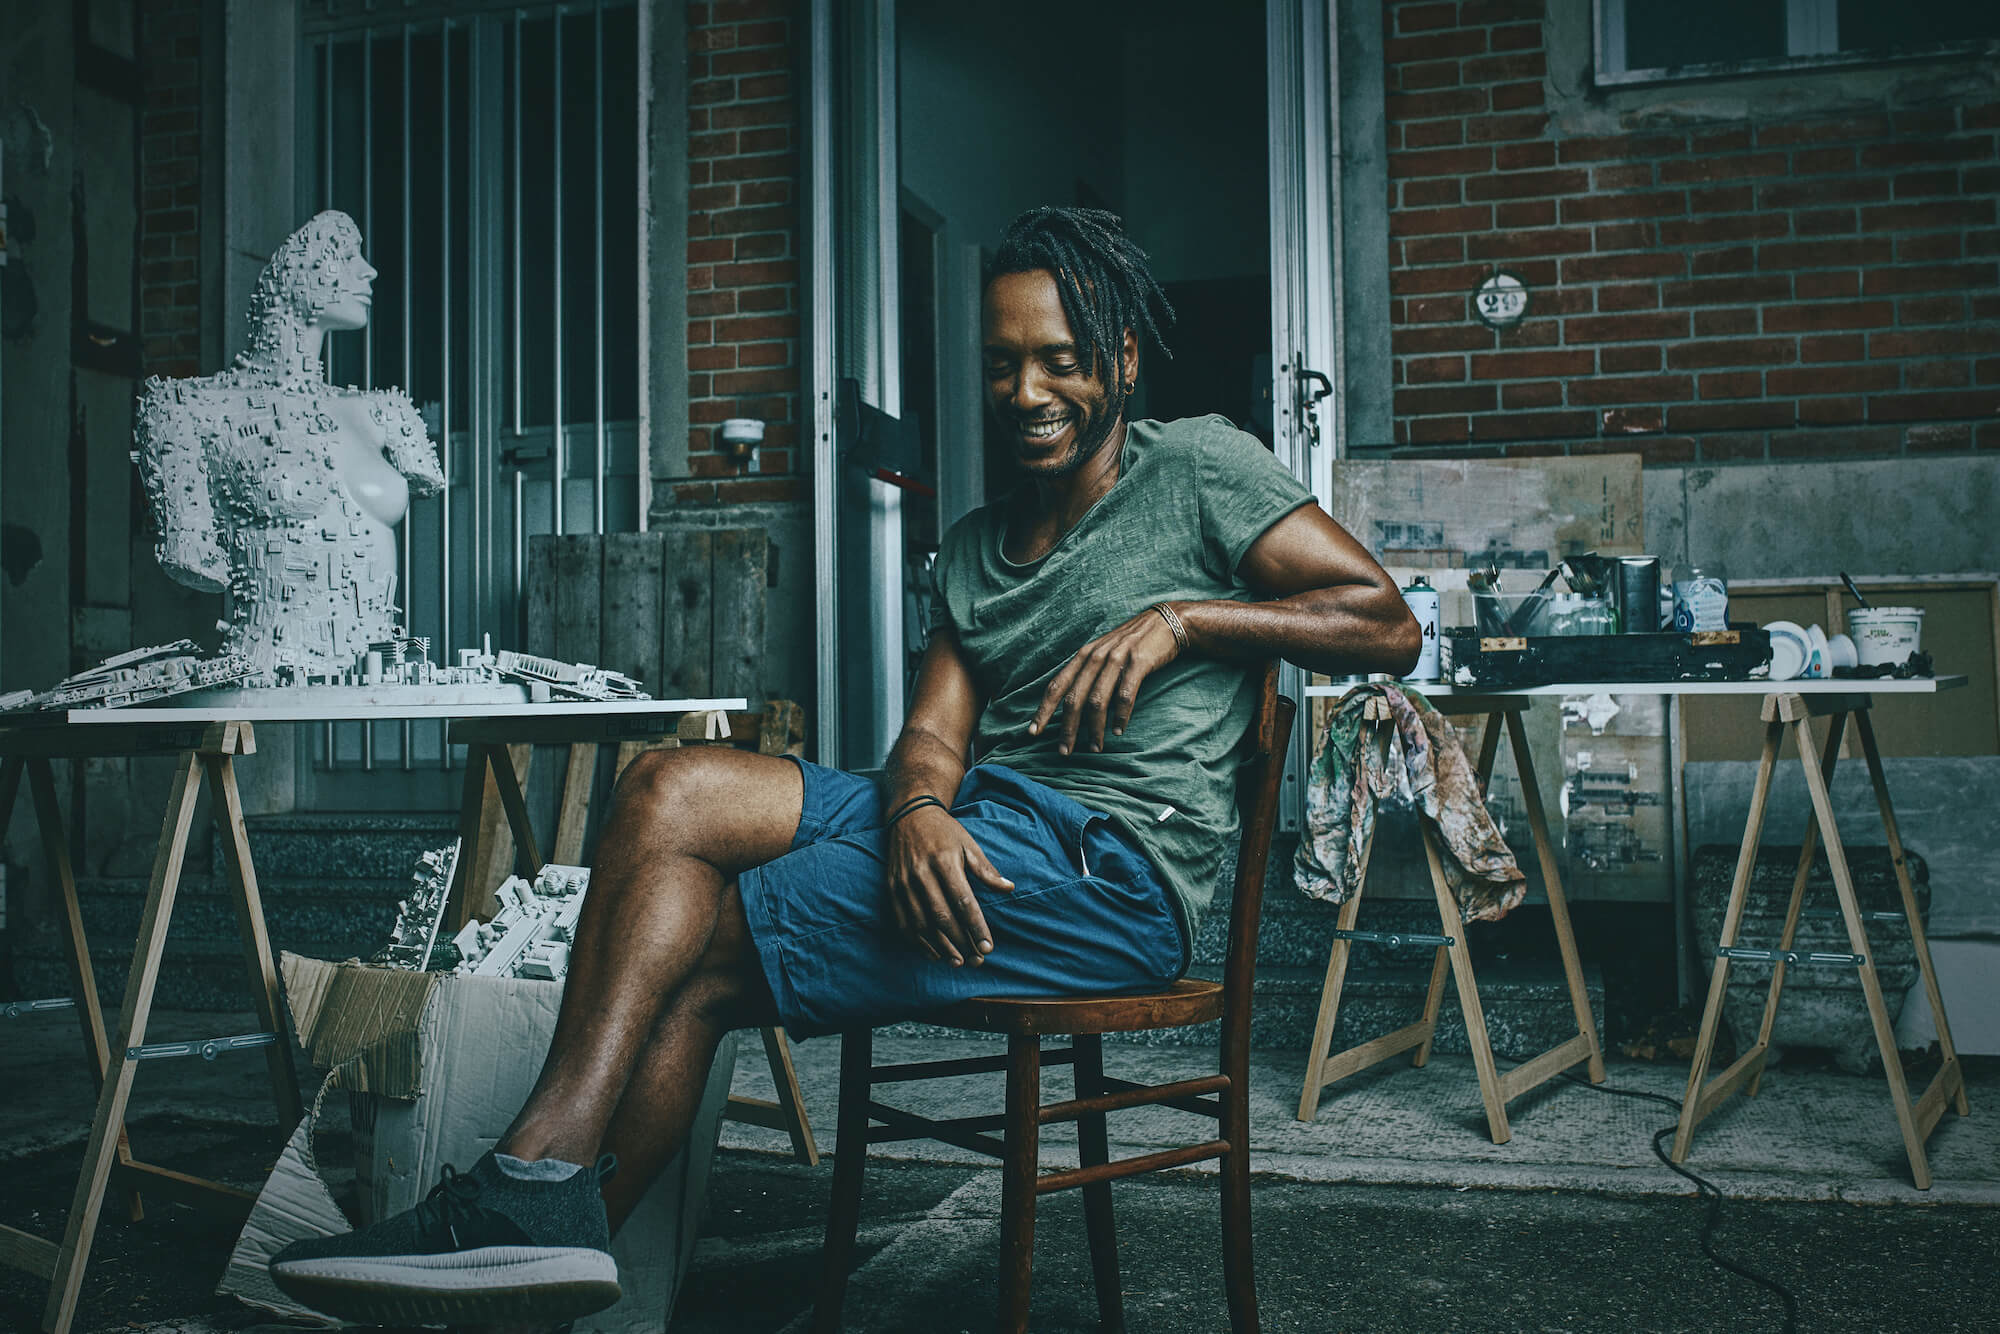 Portrait Series of Daniel Cati, black man in artist atelier